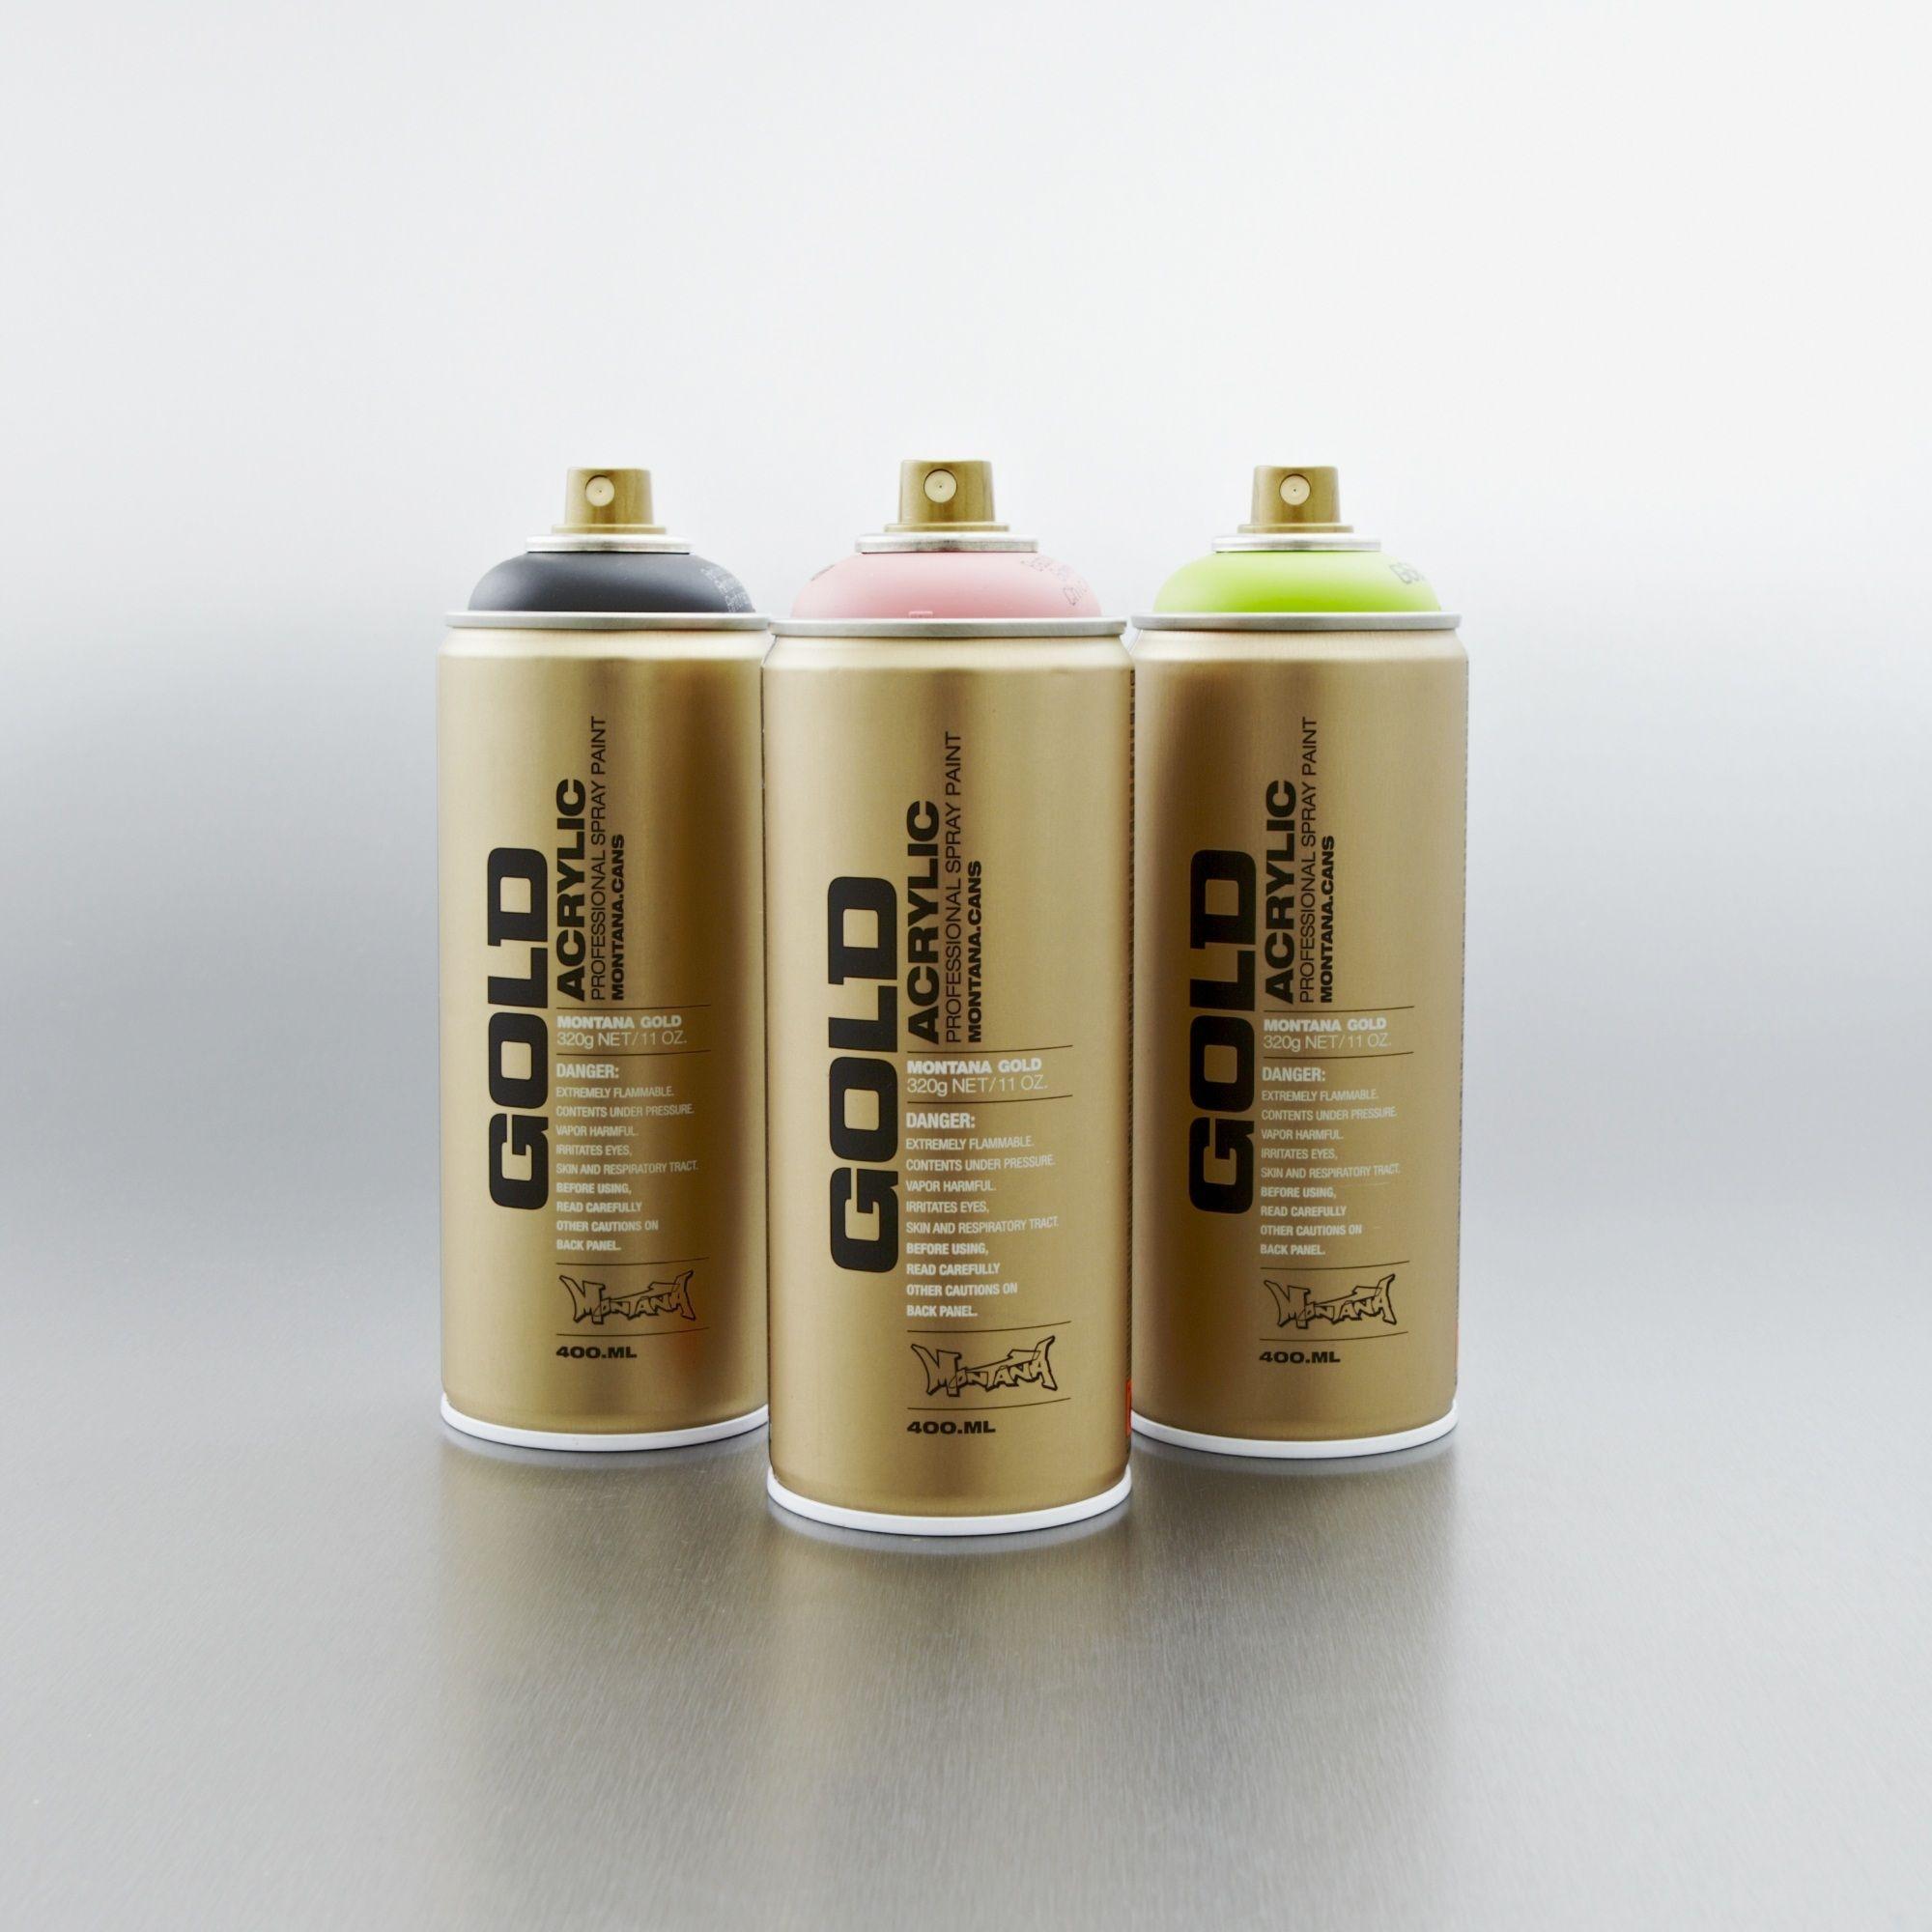 Montana Gold Spray Paint 400ml Arte